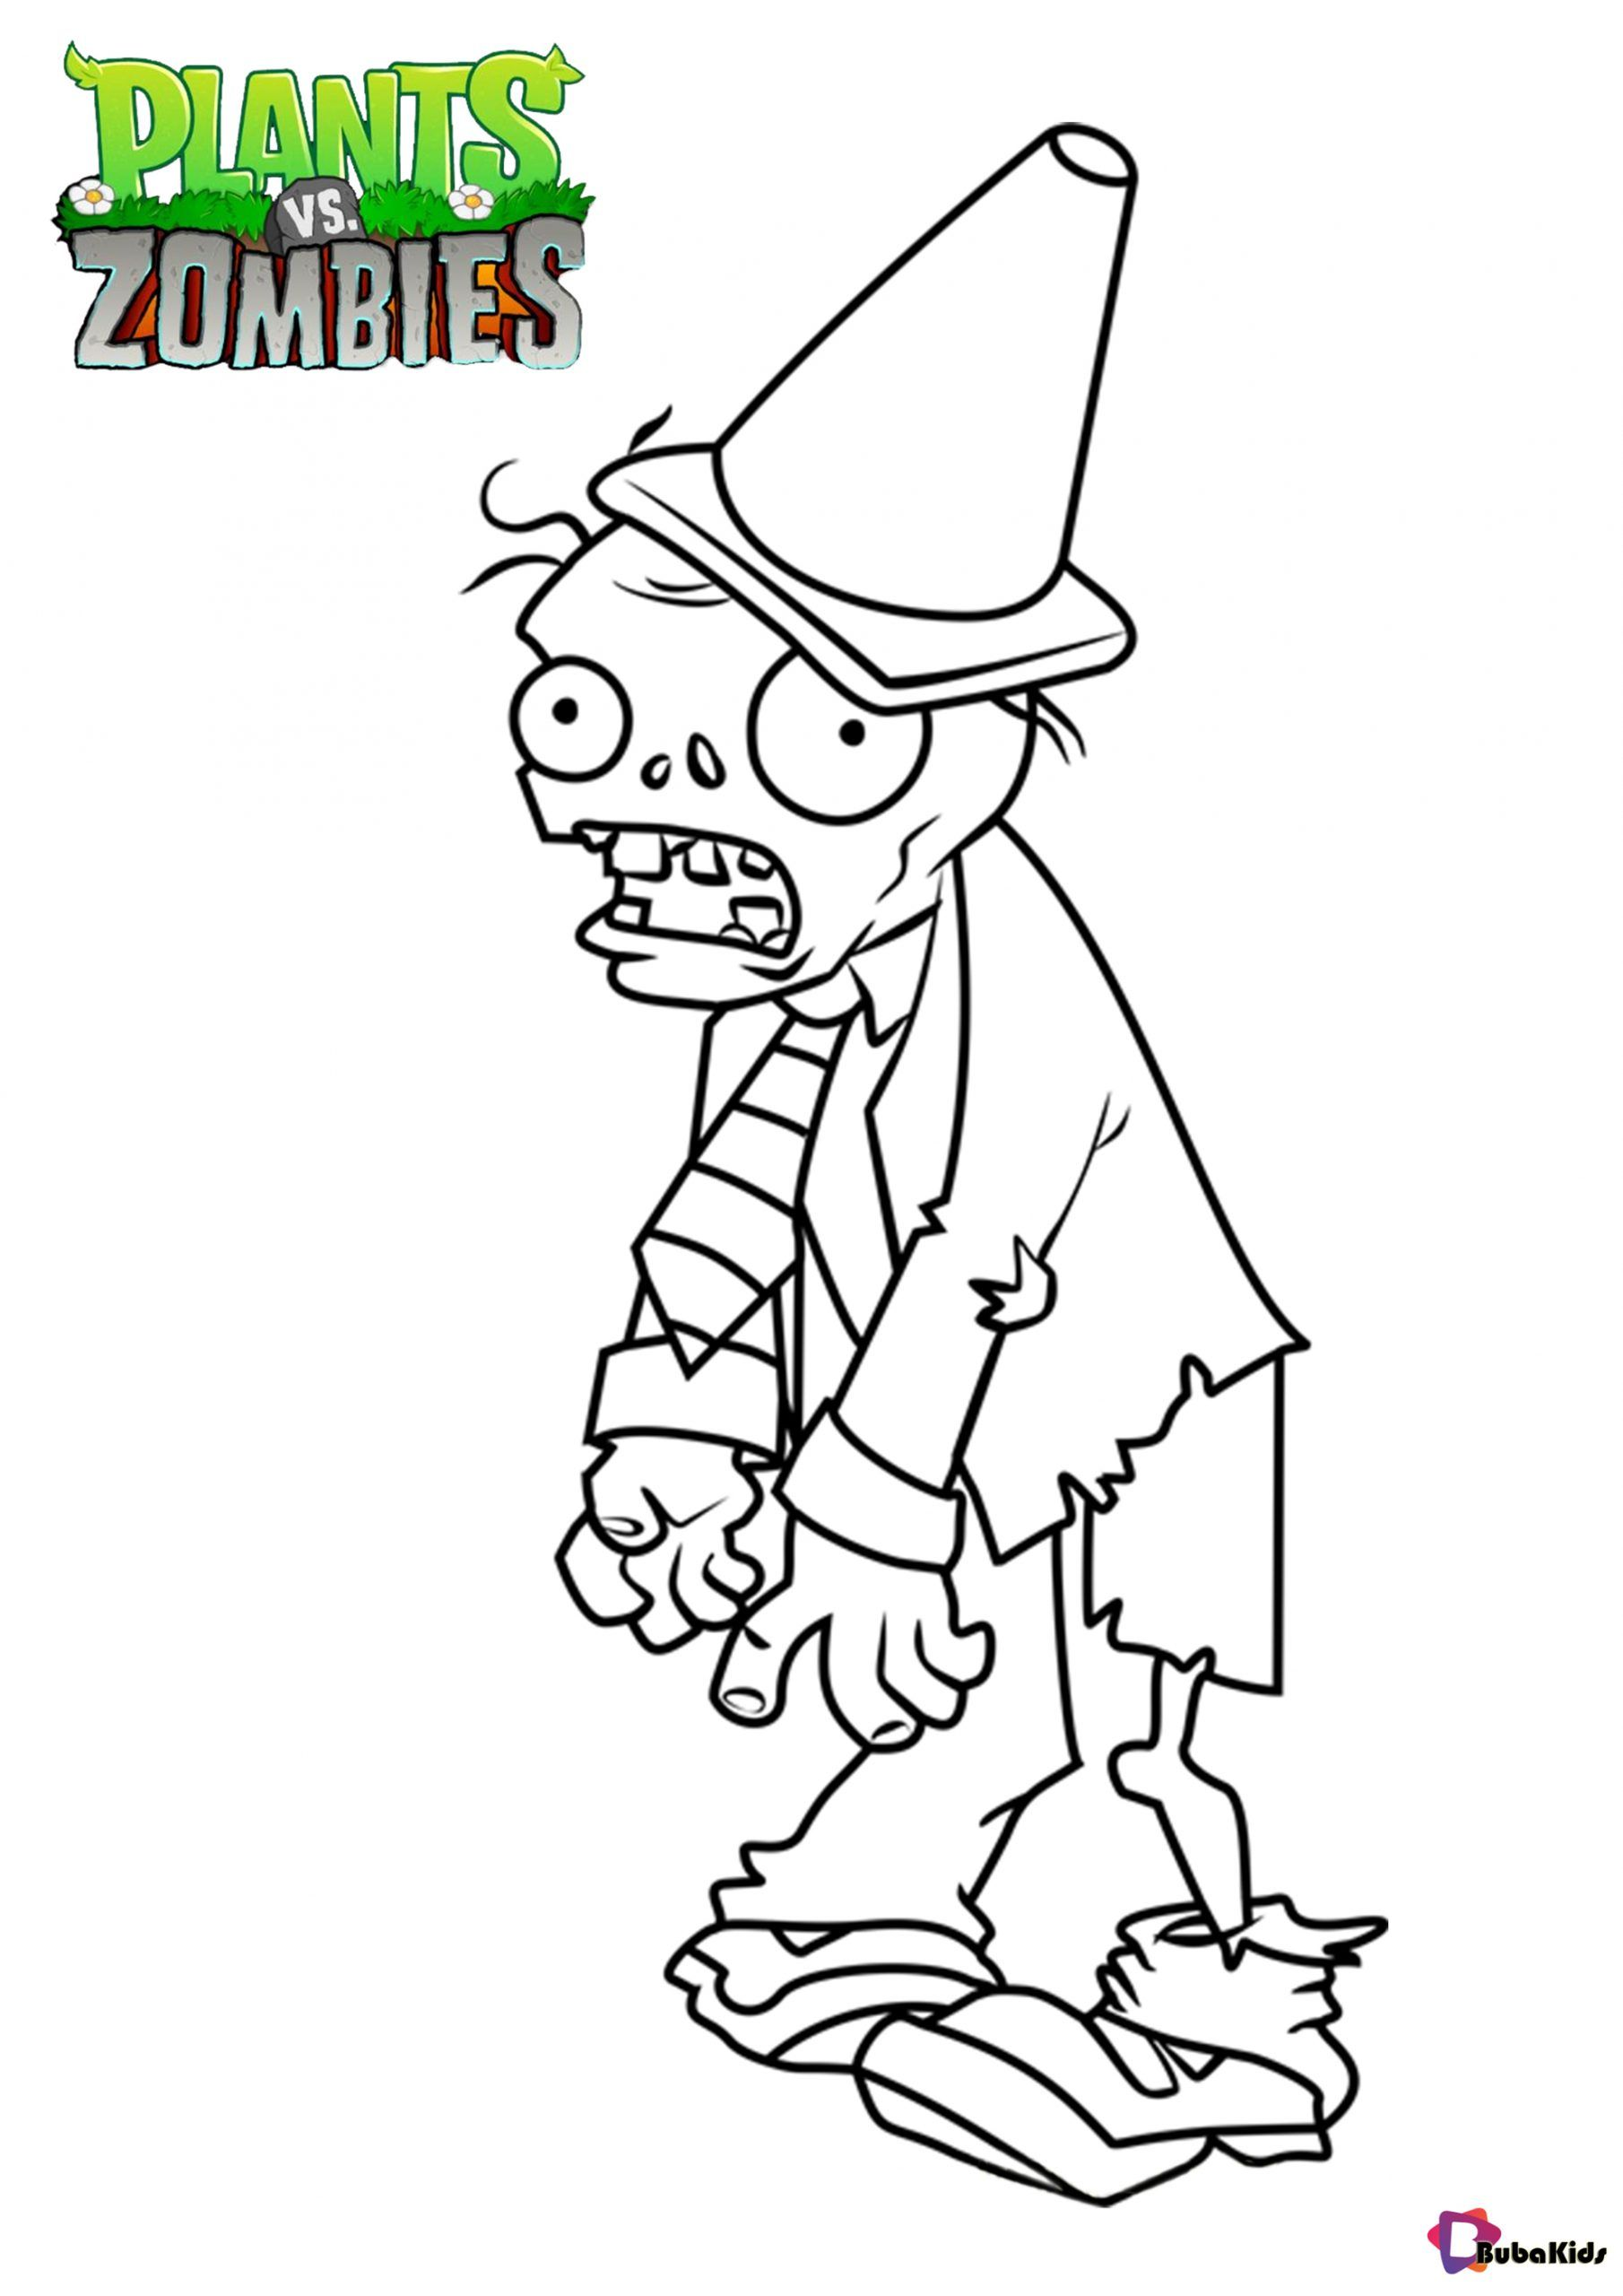 Halloween Zombie Coloring Pages Cinebrique